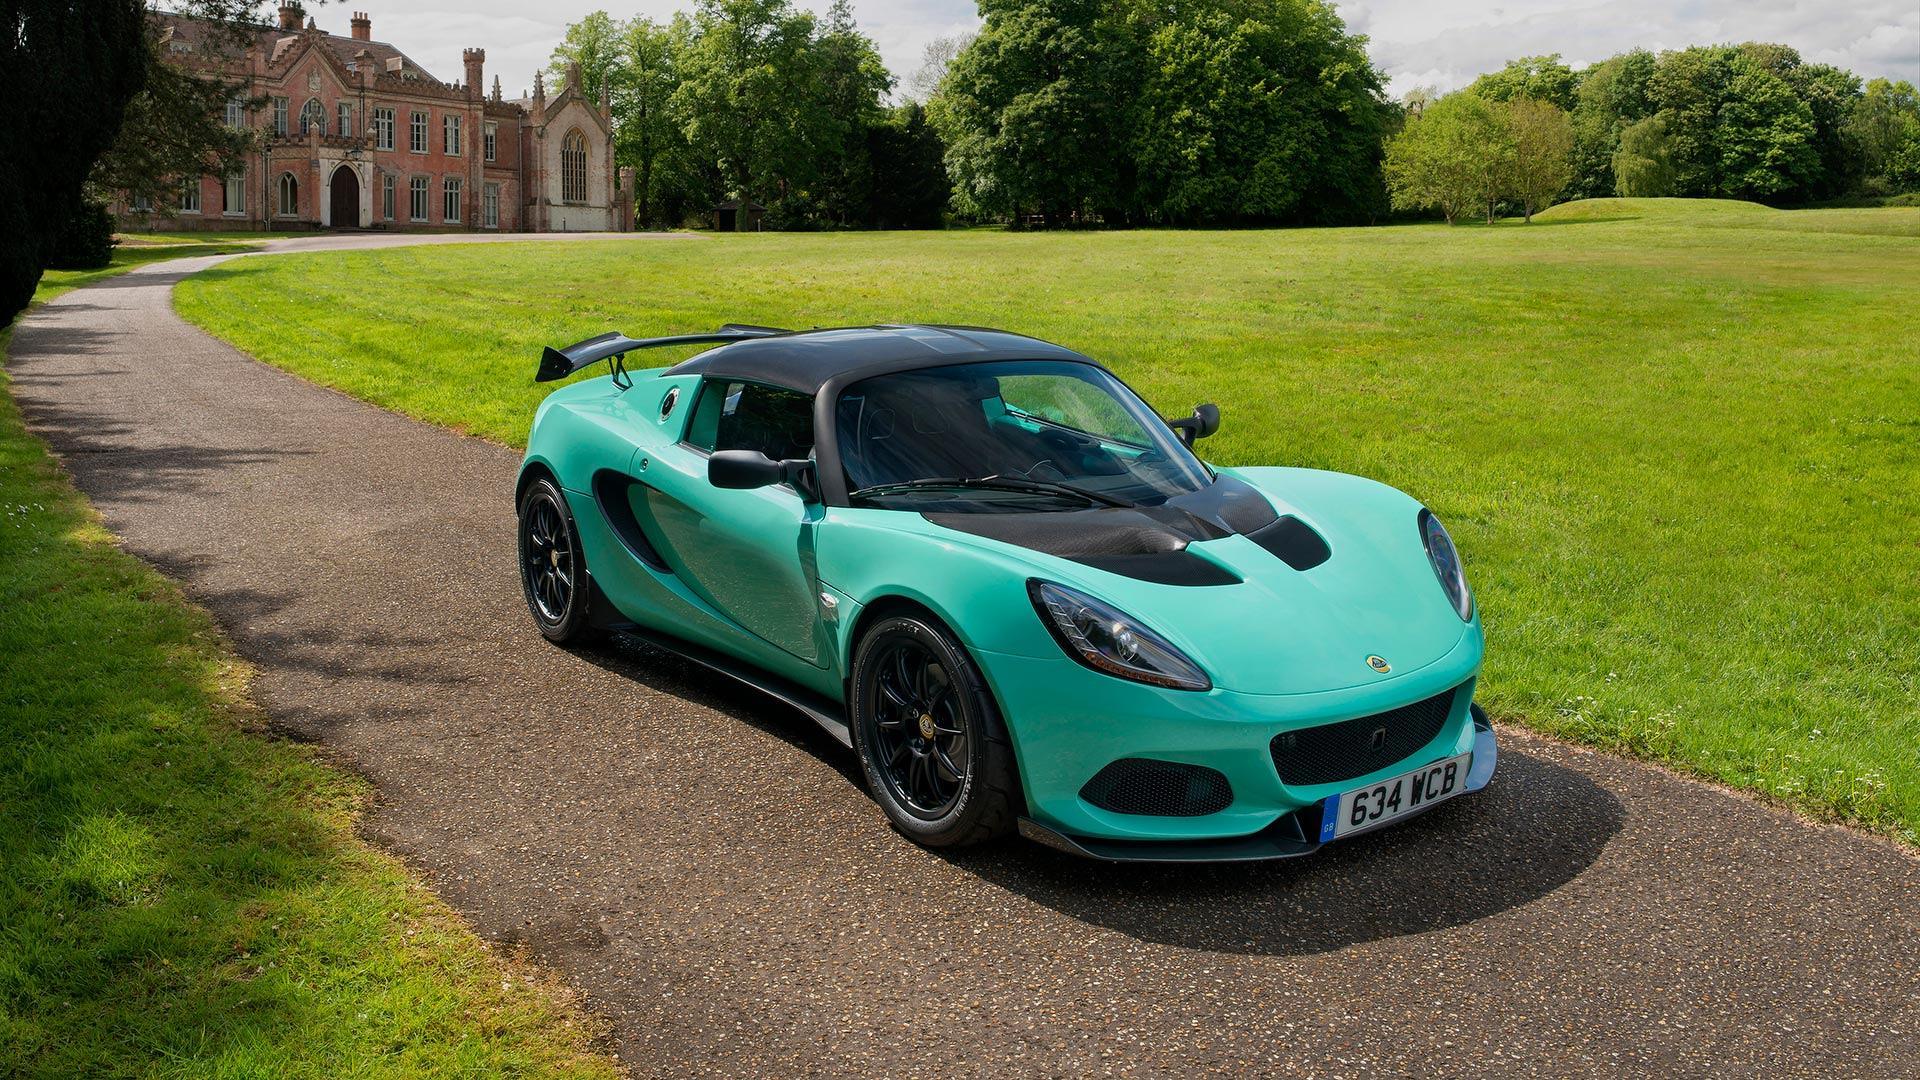 What Car Company Makes Lotus